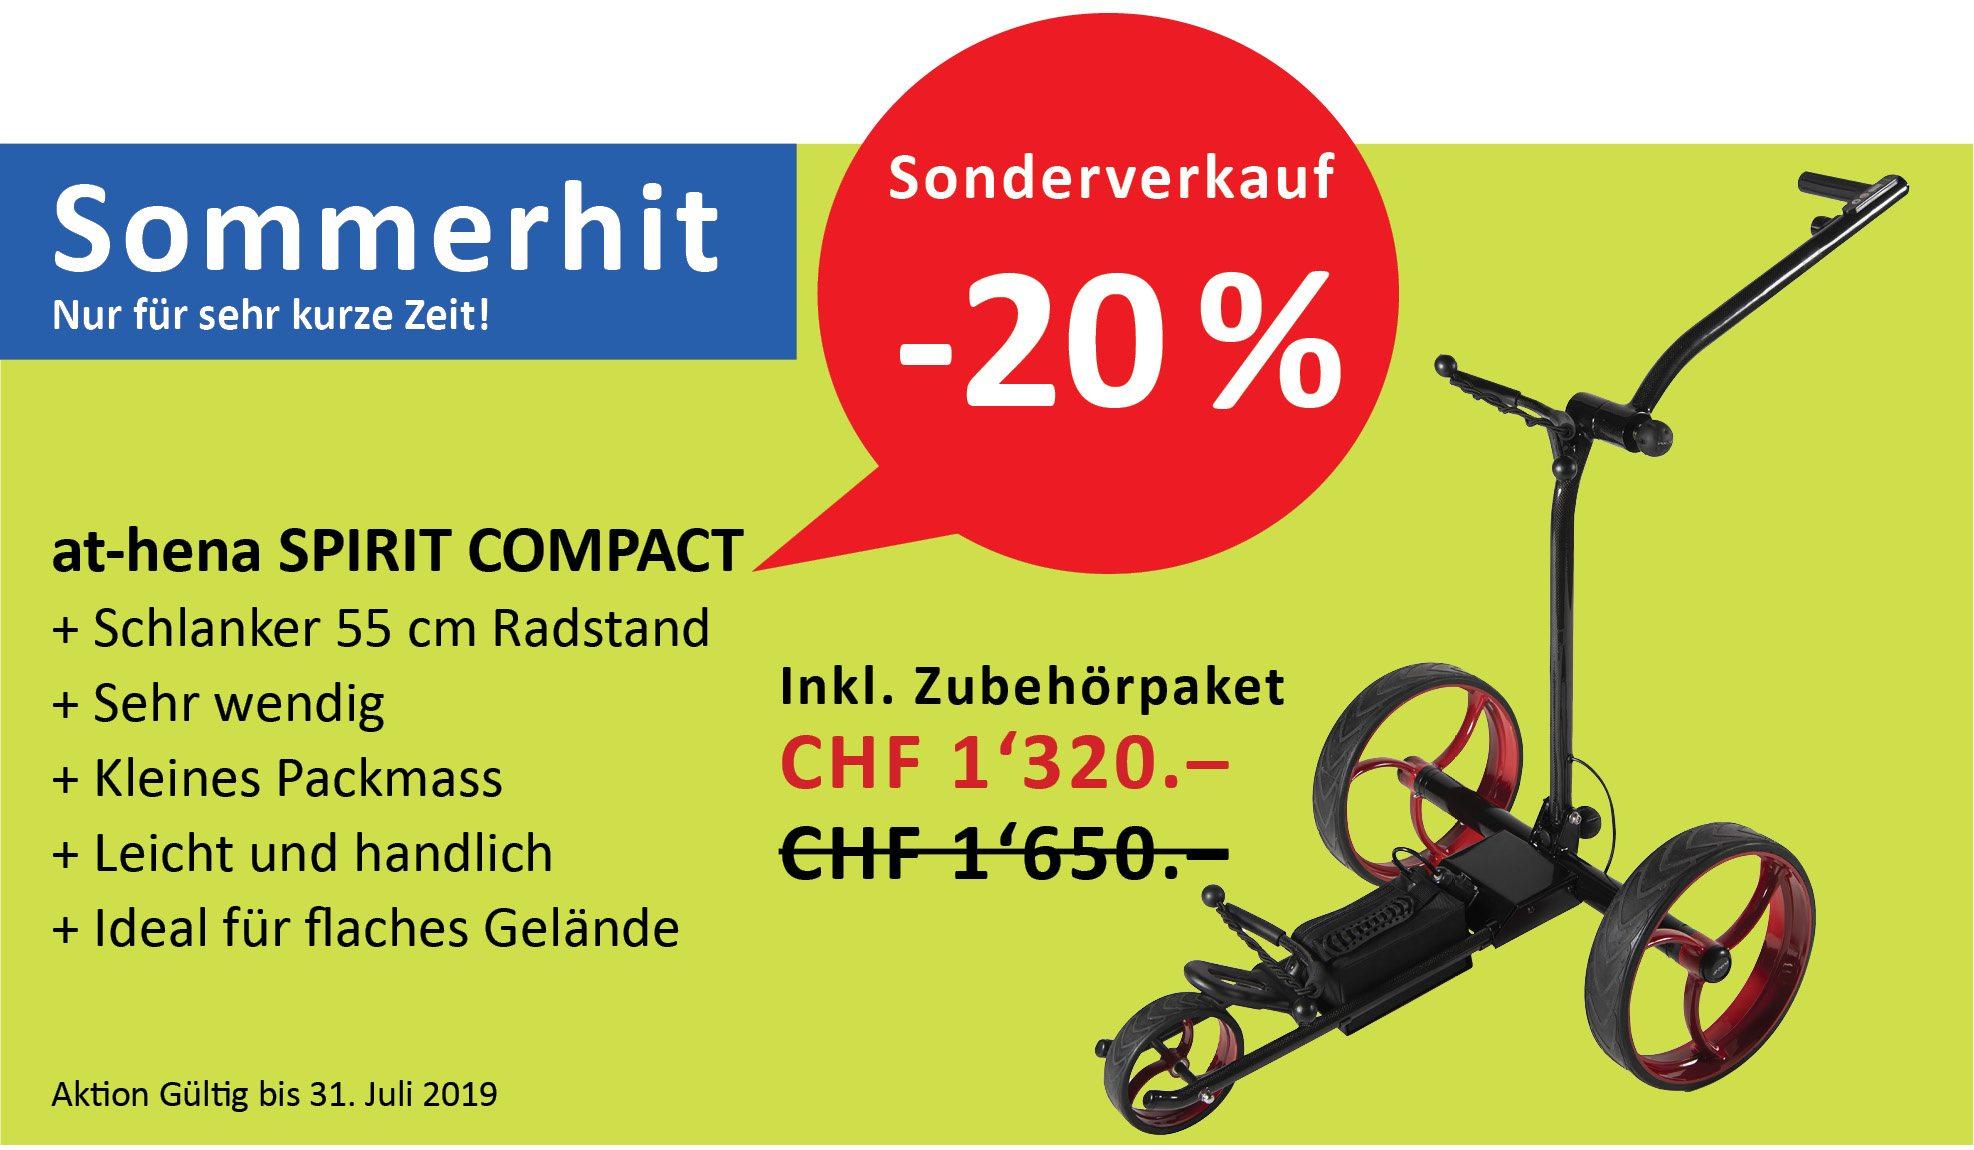 at-hena Eletro Golf Trolley Sonderverkauf SPRIT COMPACT